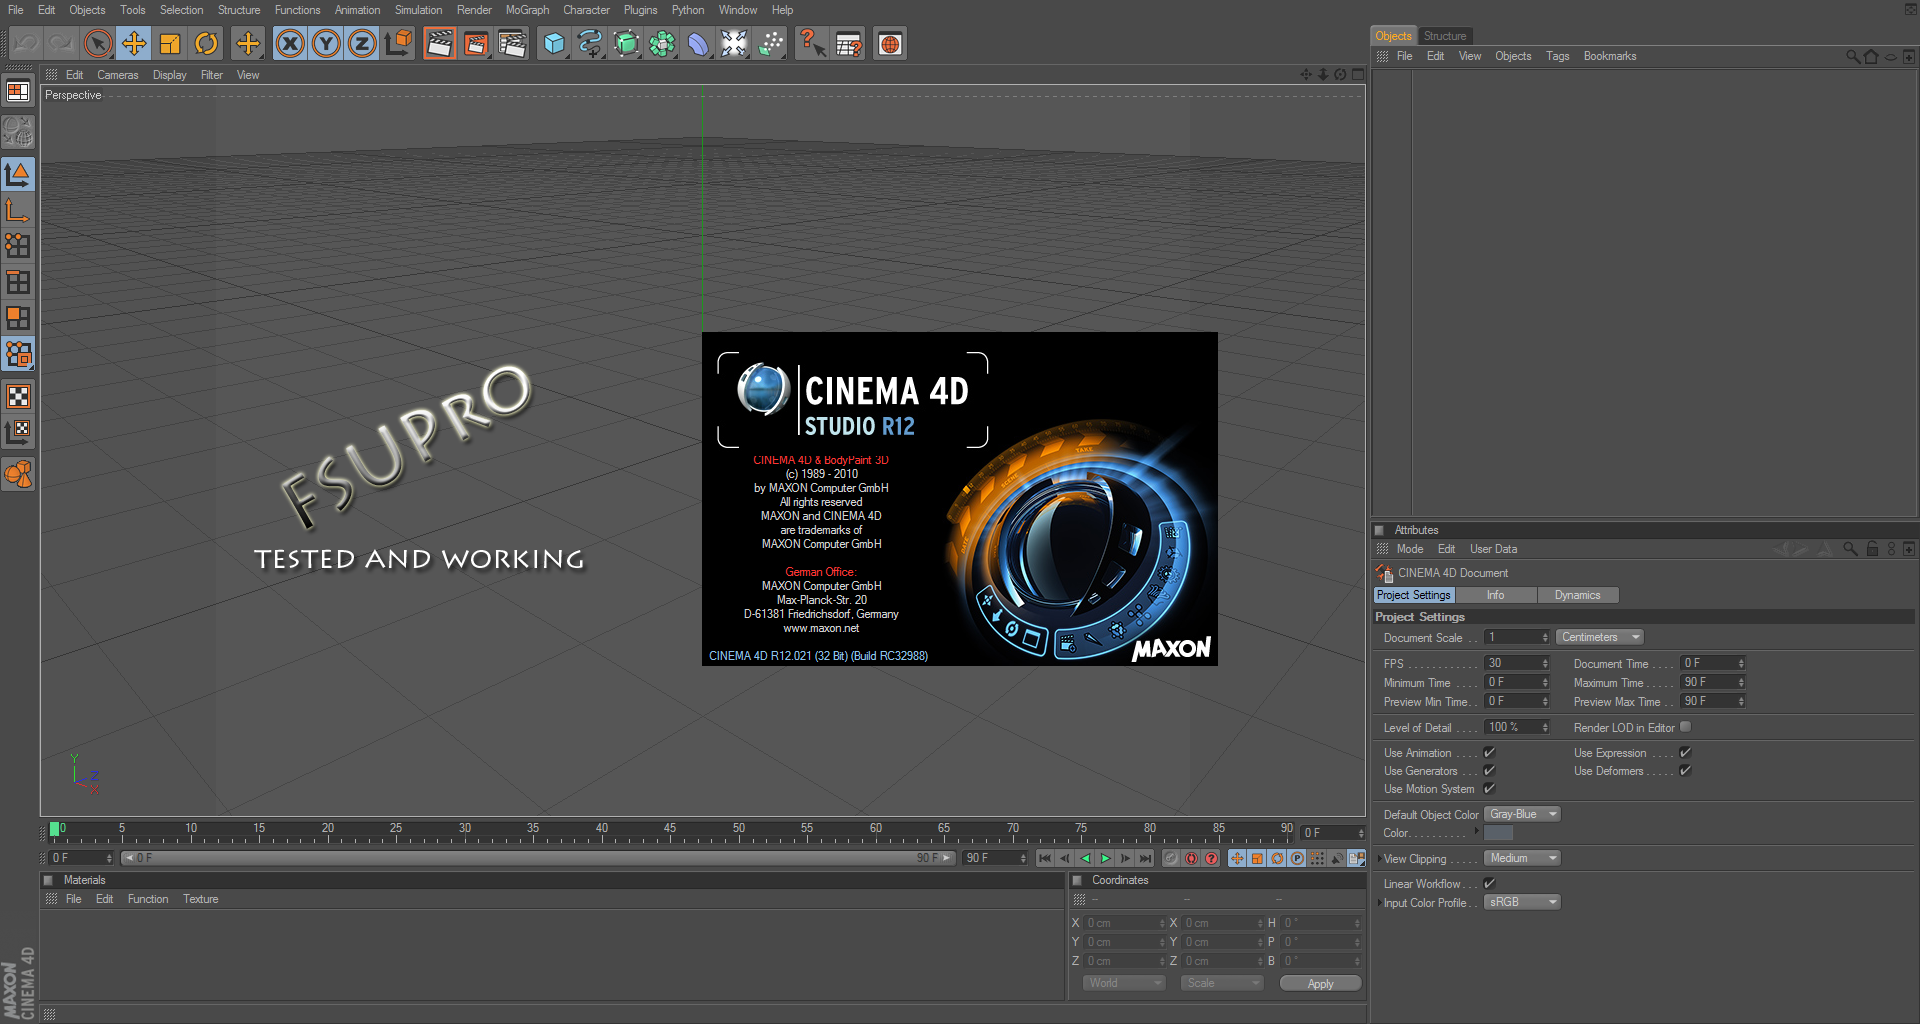 cinema 4d r12 full version mac